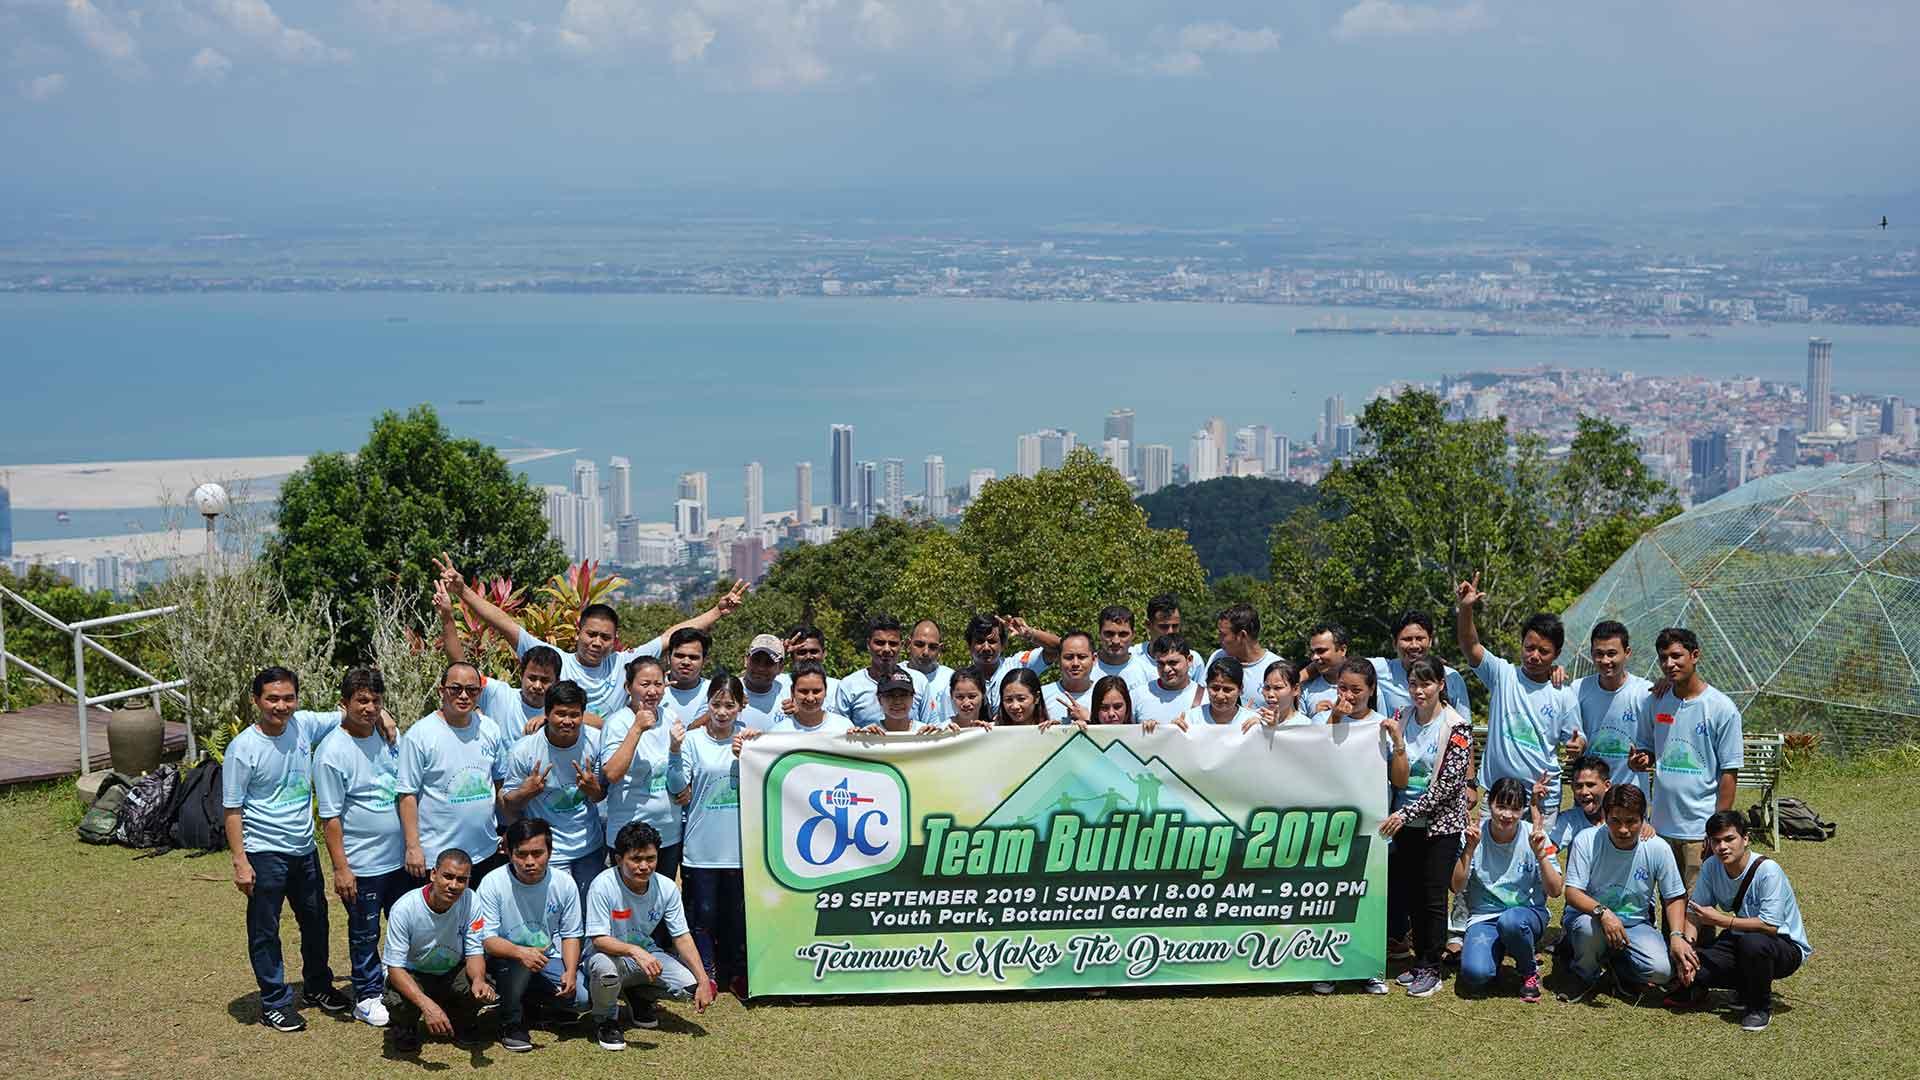 Penang Hill team building